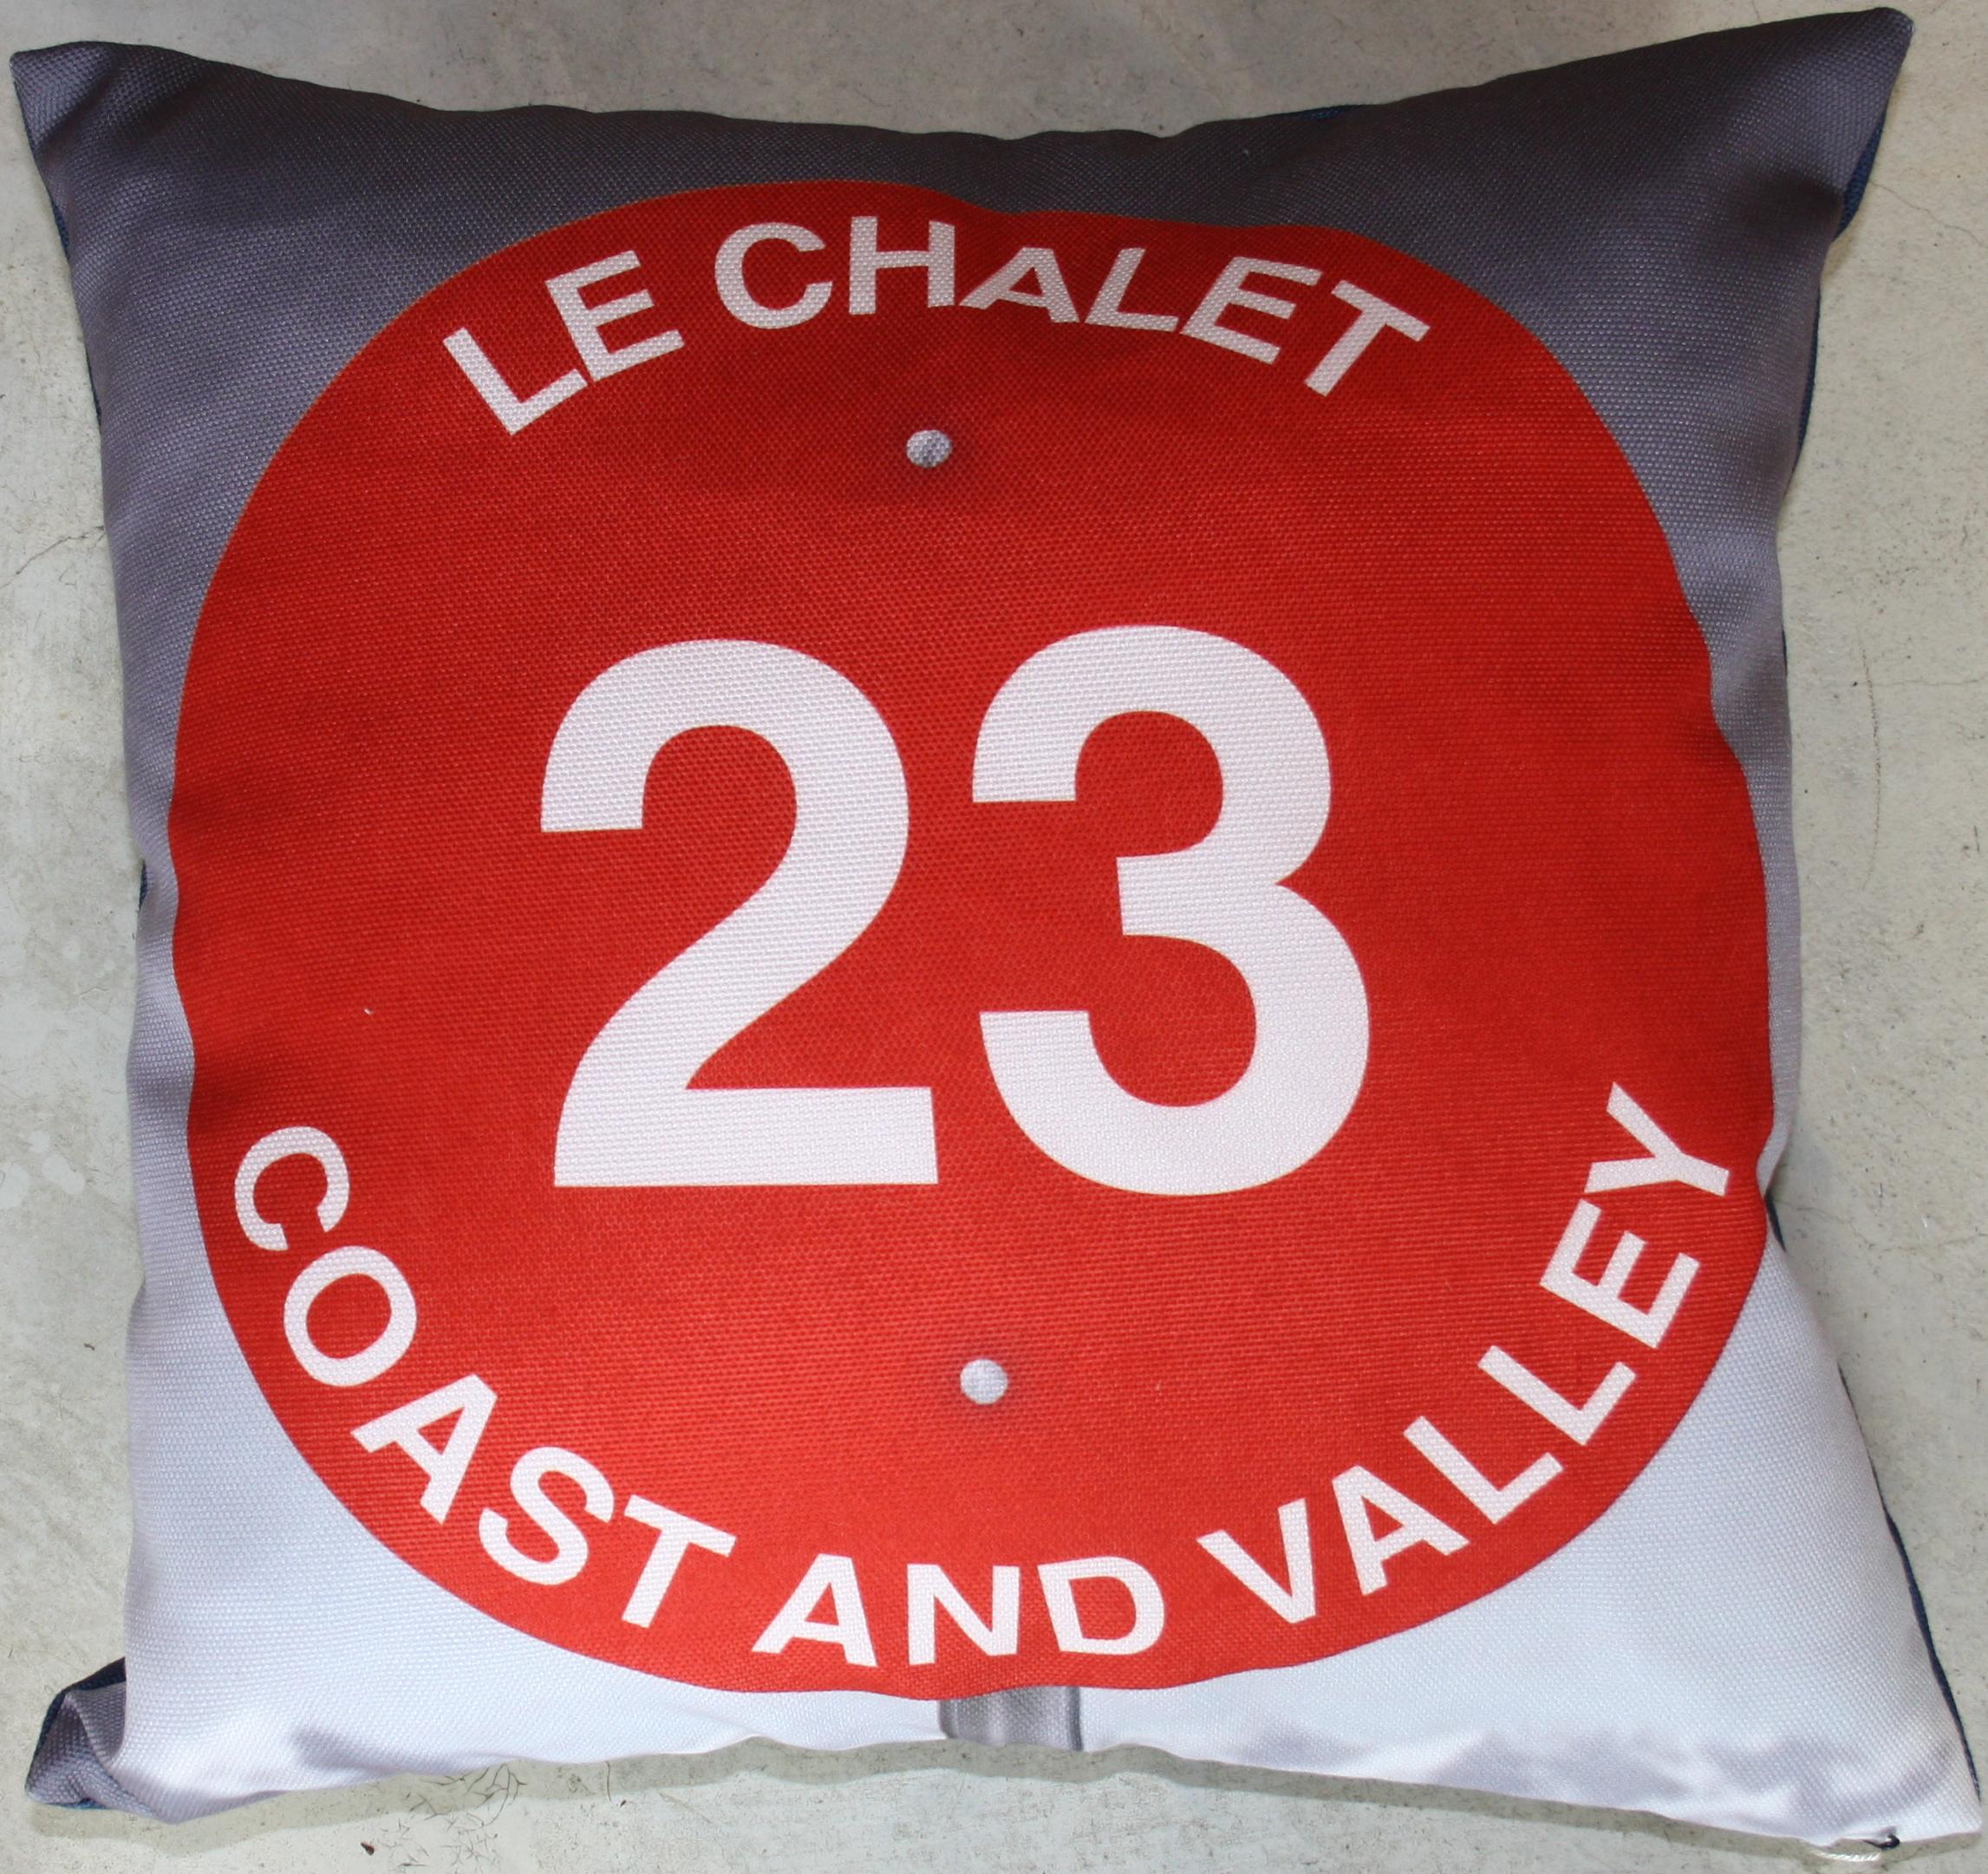 Chalet coast.png